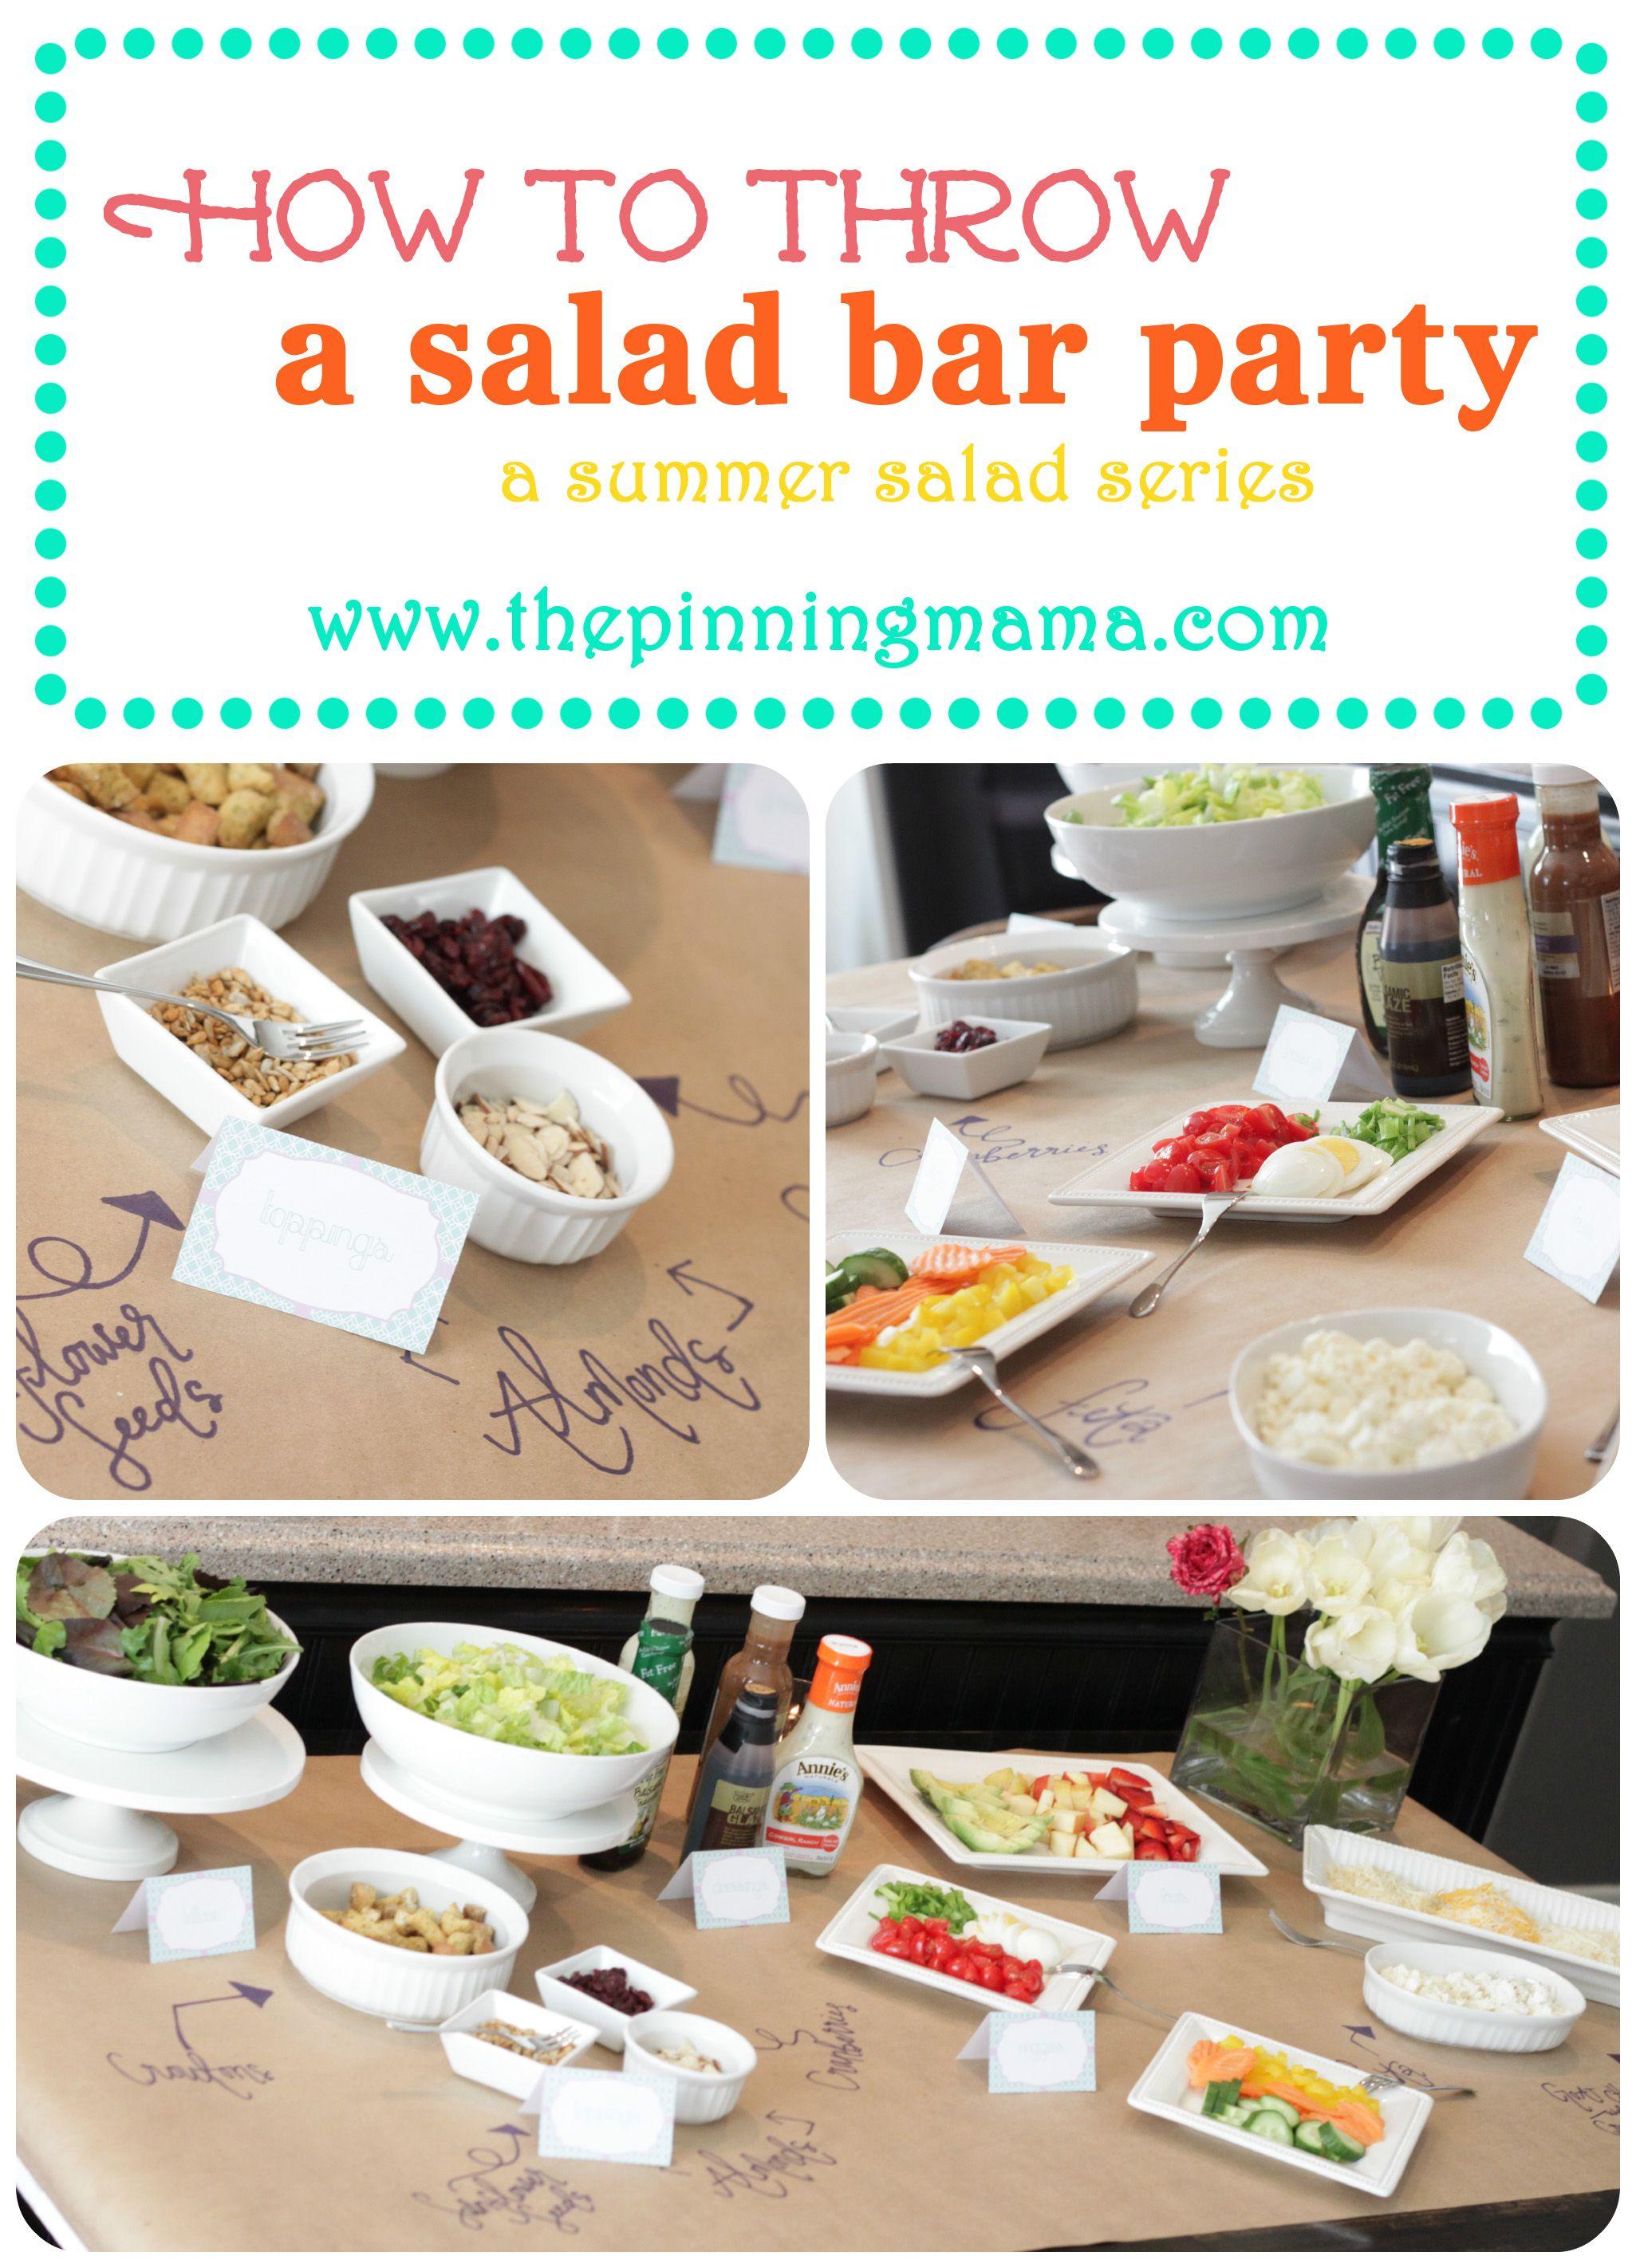 Salad Bar Party on Pinterest | Salad Bar, Taco Salad Bar ...